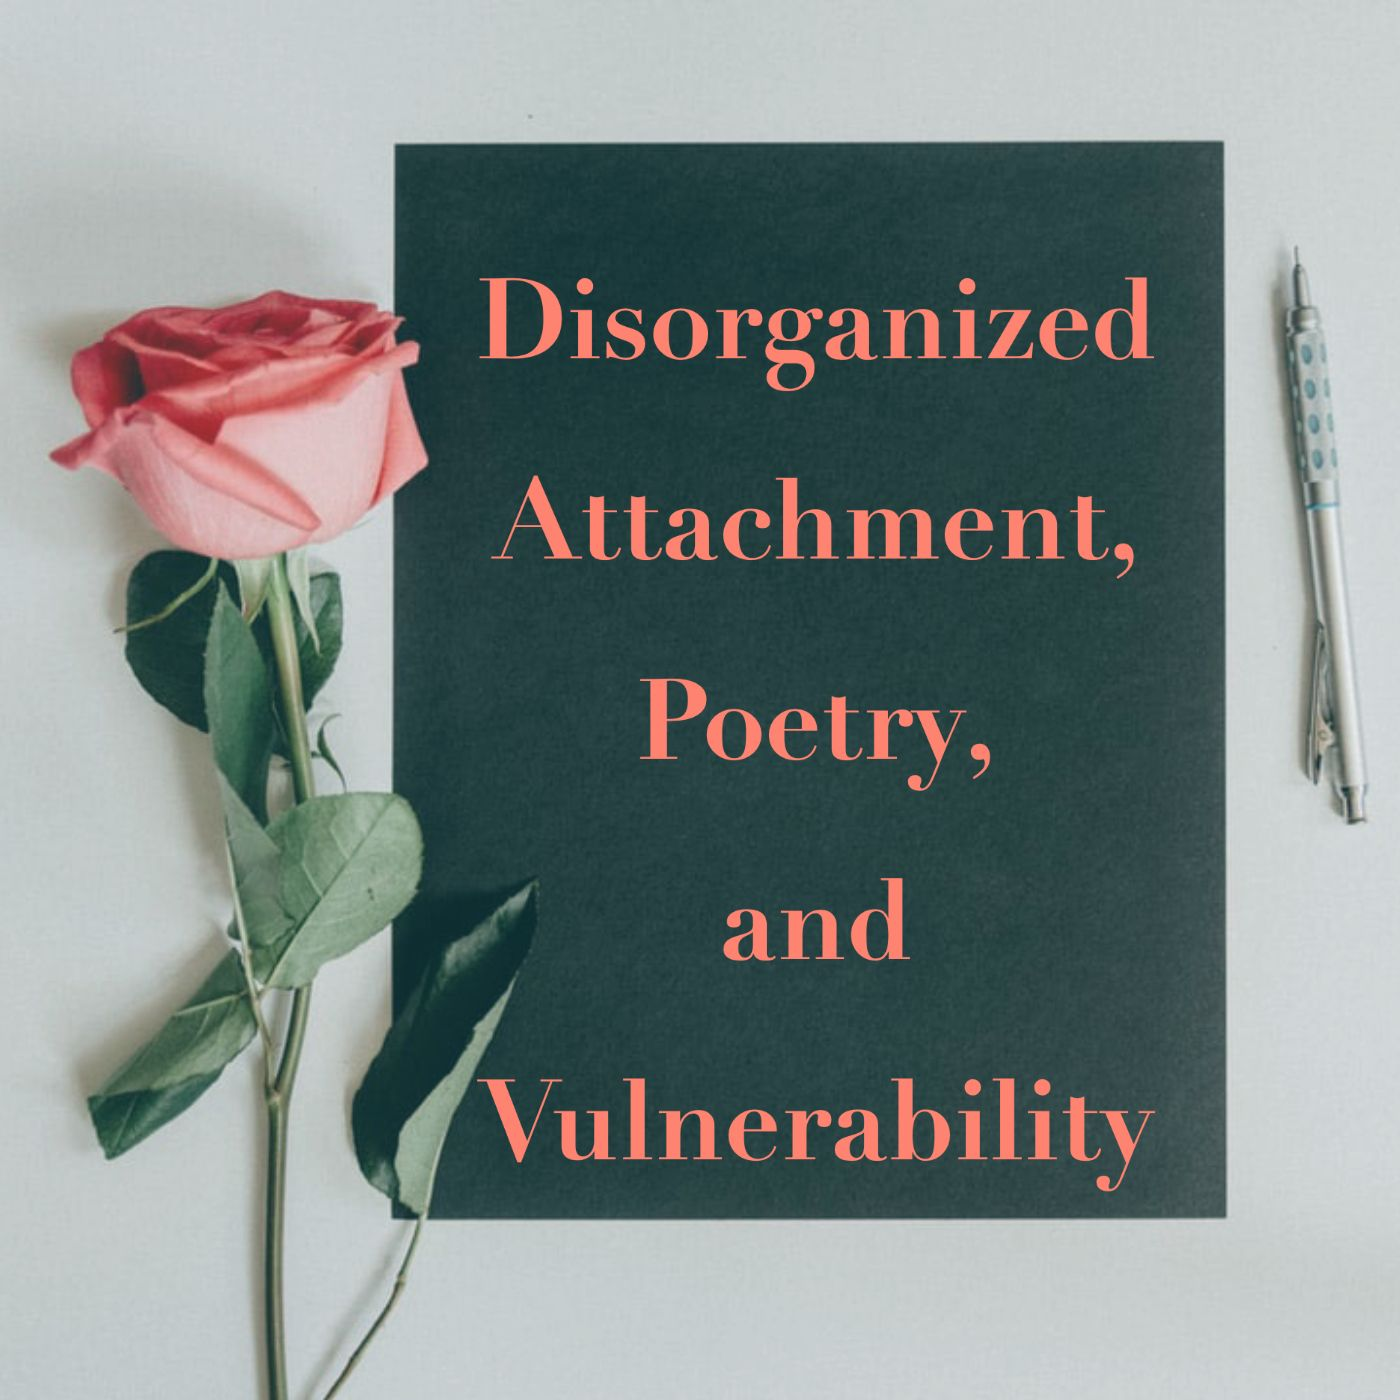 Disorganized Attachment, Poetry, and Vulnerability (2020 Rerun)